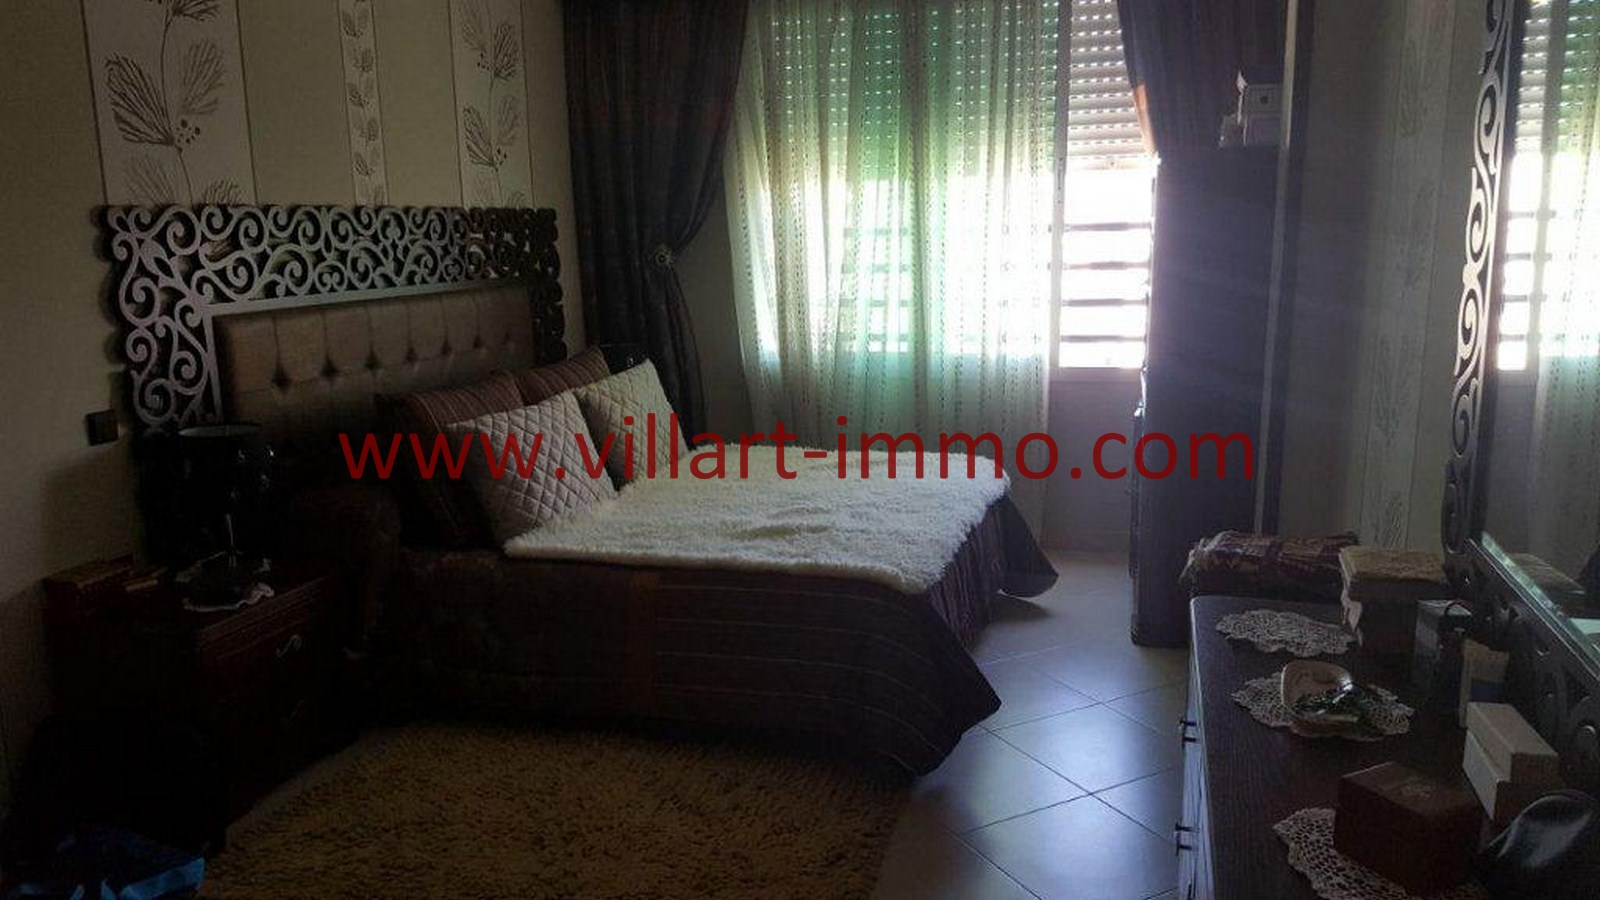 6-Vente-Appartement-Tanger-Chambre 2-VA523-Centre ville -Villart Immo